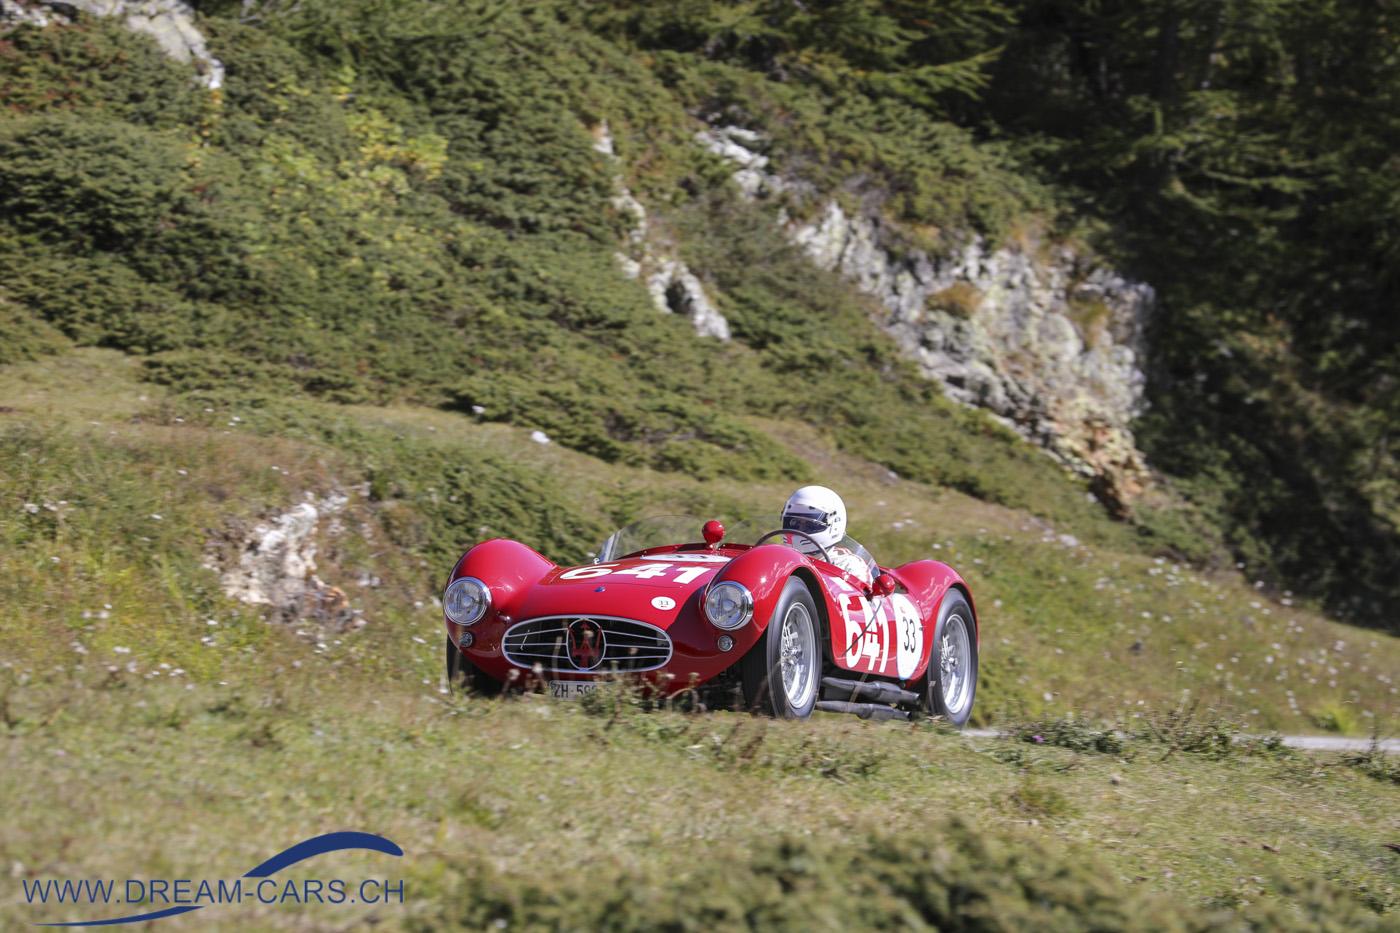 Bernina Gran Turismo, 17. - 19. September 2021. Gian-Pietro Rossetti mit seinem wunderschönen Maserati A6 GCS Fantuzzi